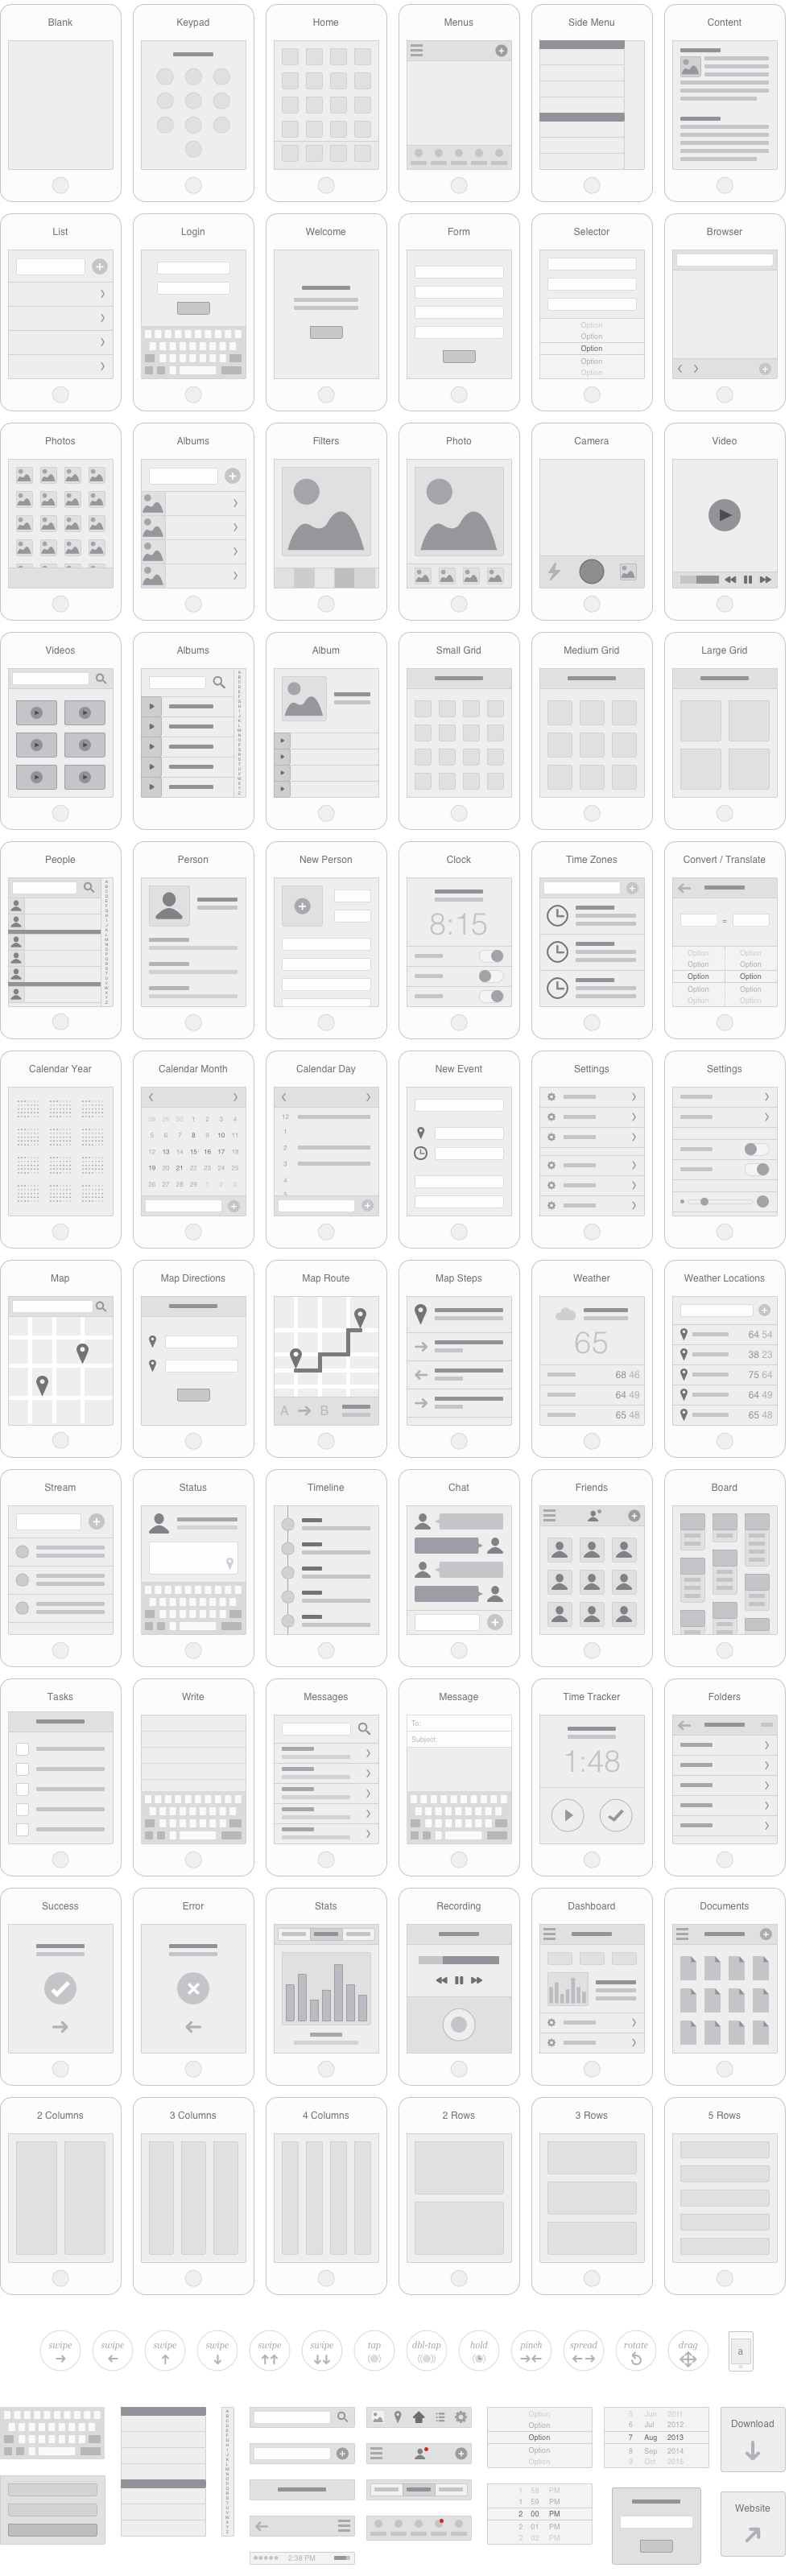 Mobile App Visual Flowchart for Illustrator, OmniGraffle or Sketch ...